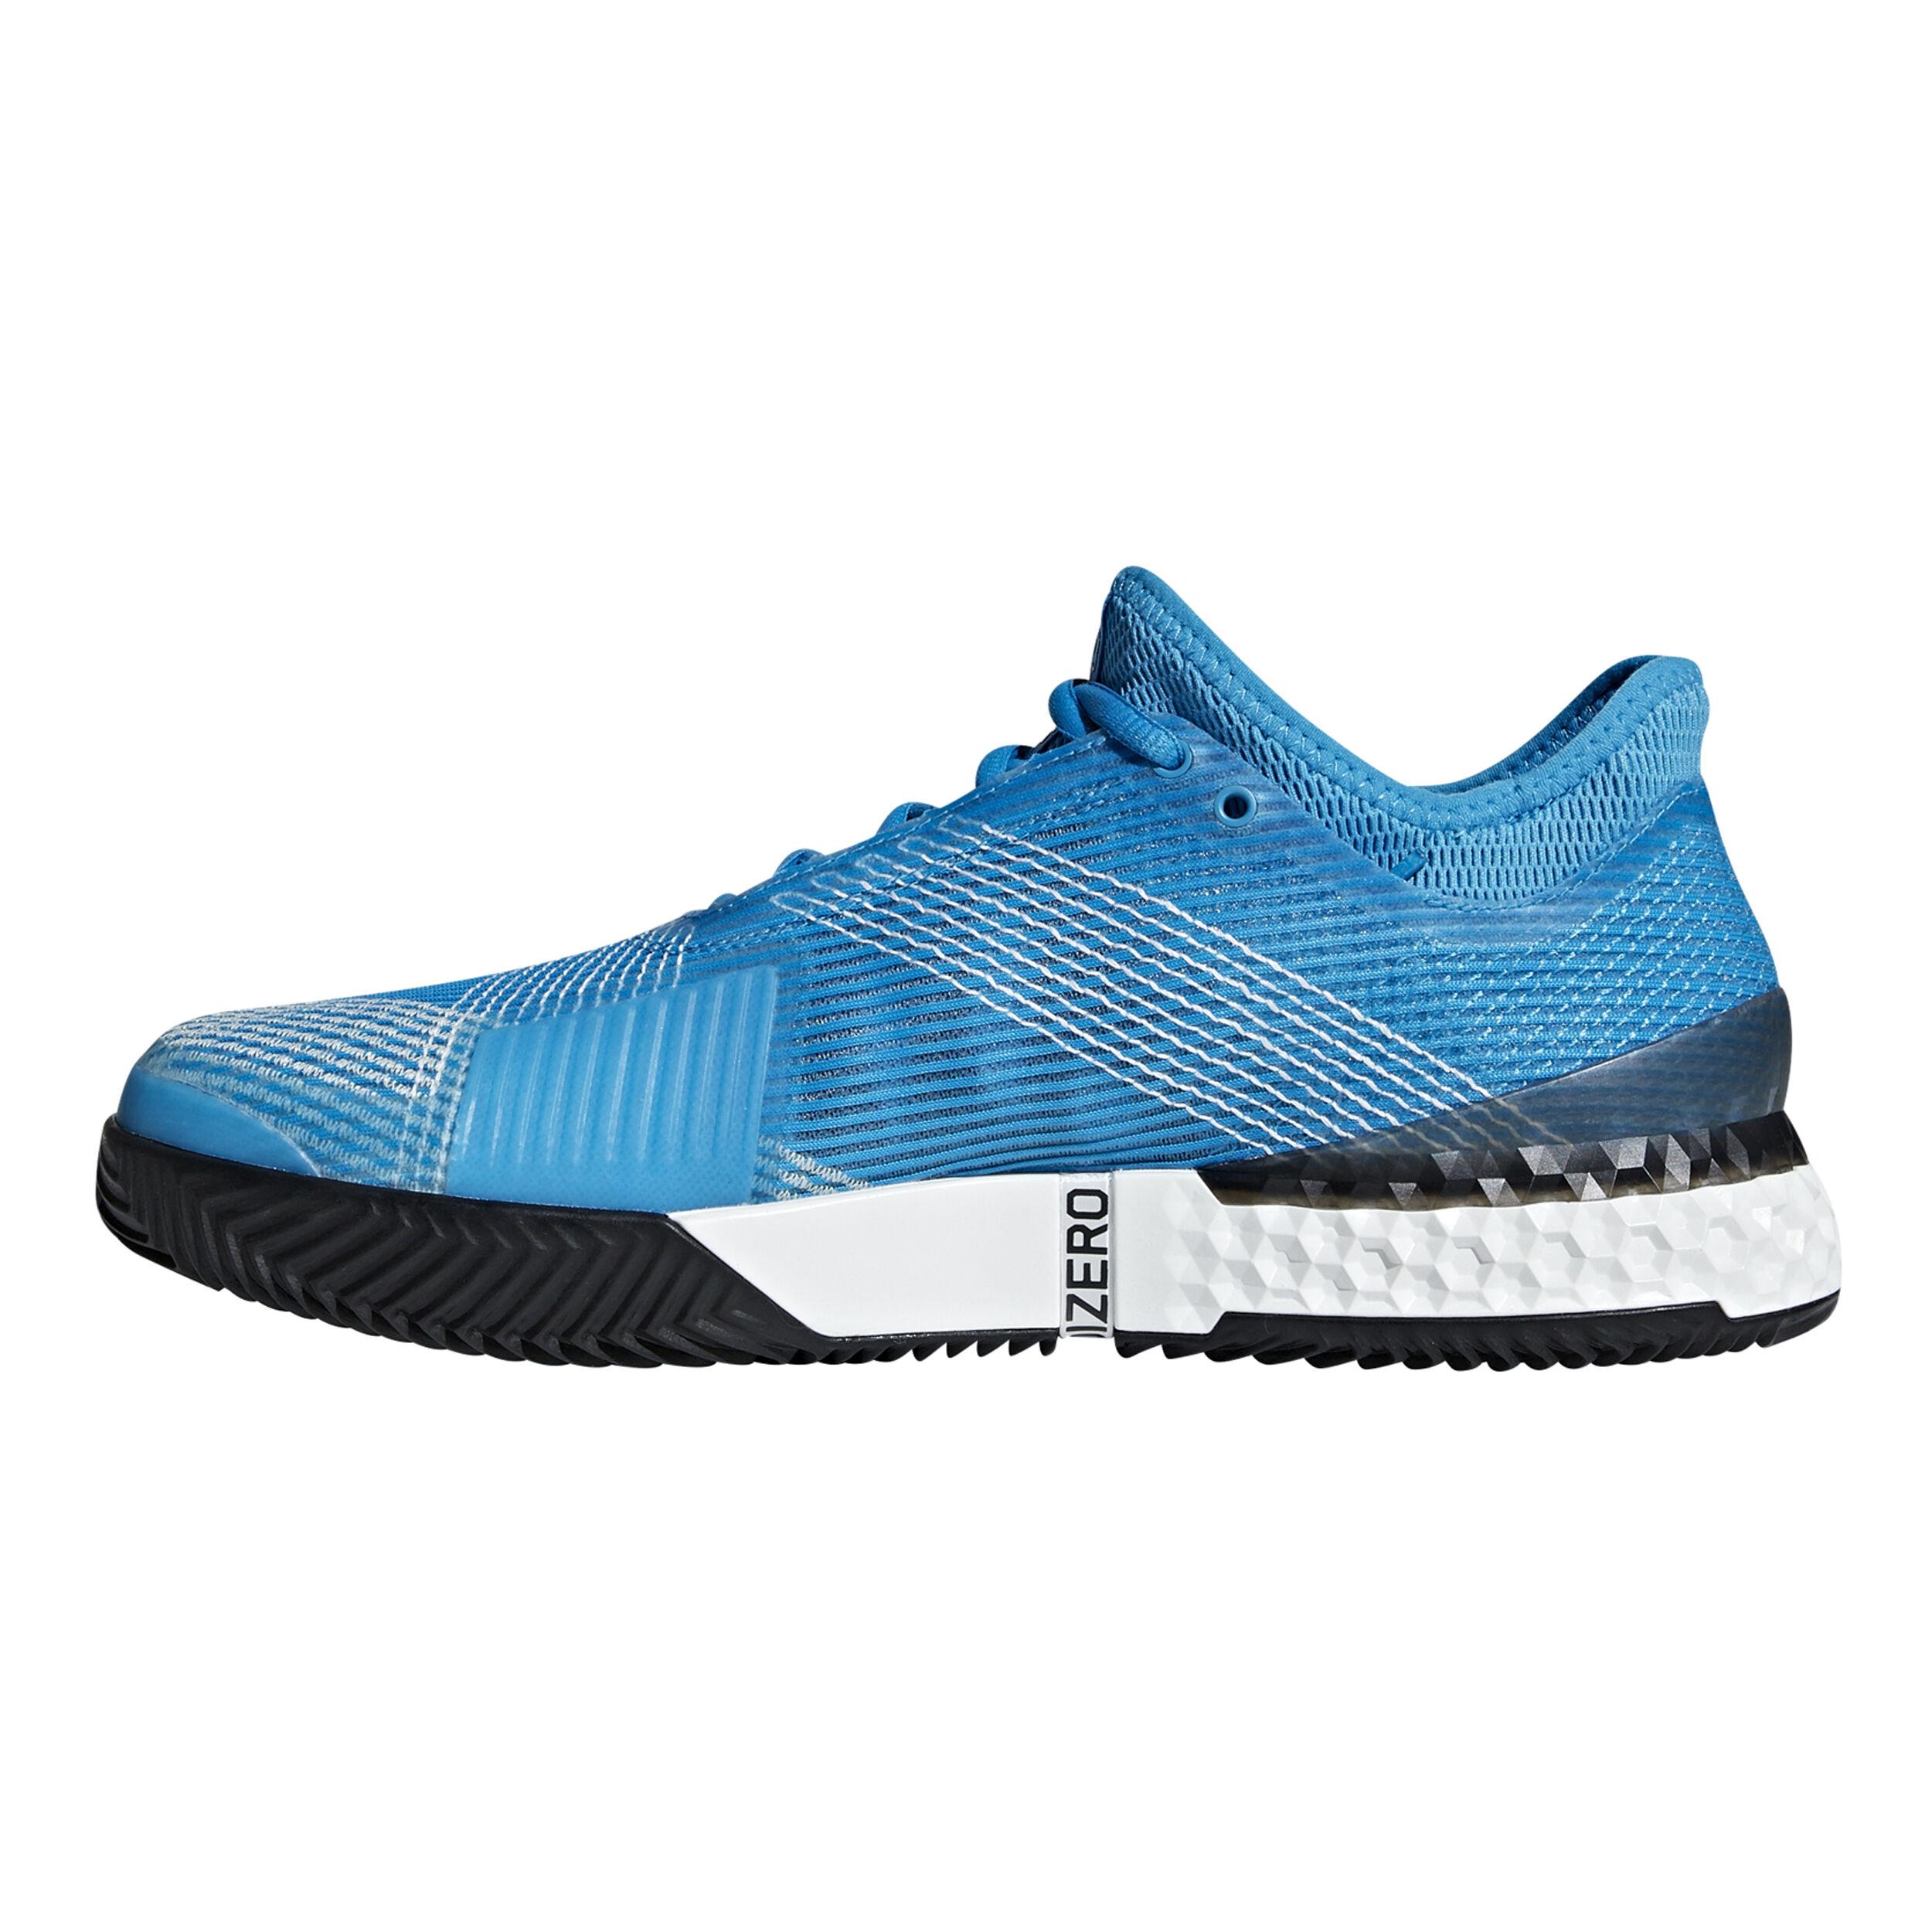 adidas Adizero Ubersonic 3 Clay Herren Blau, Weiß online